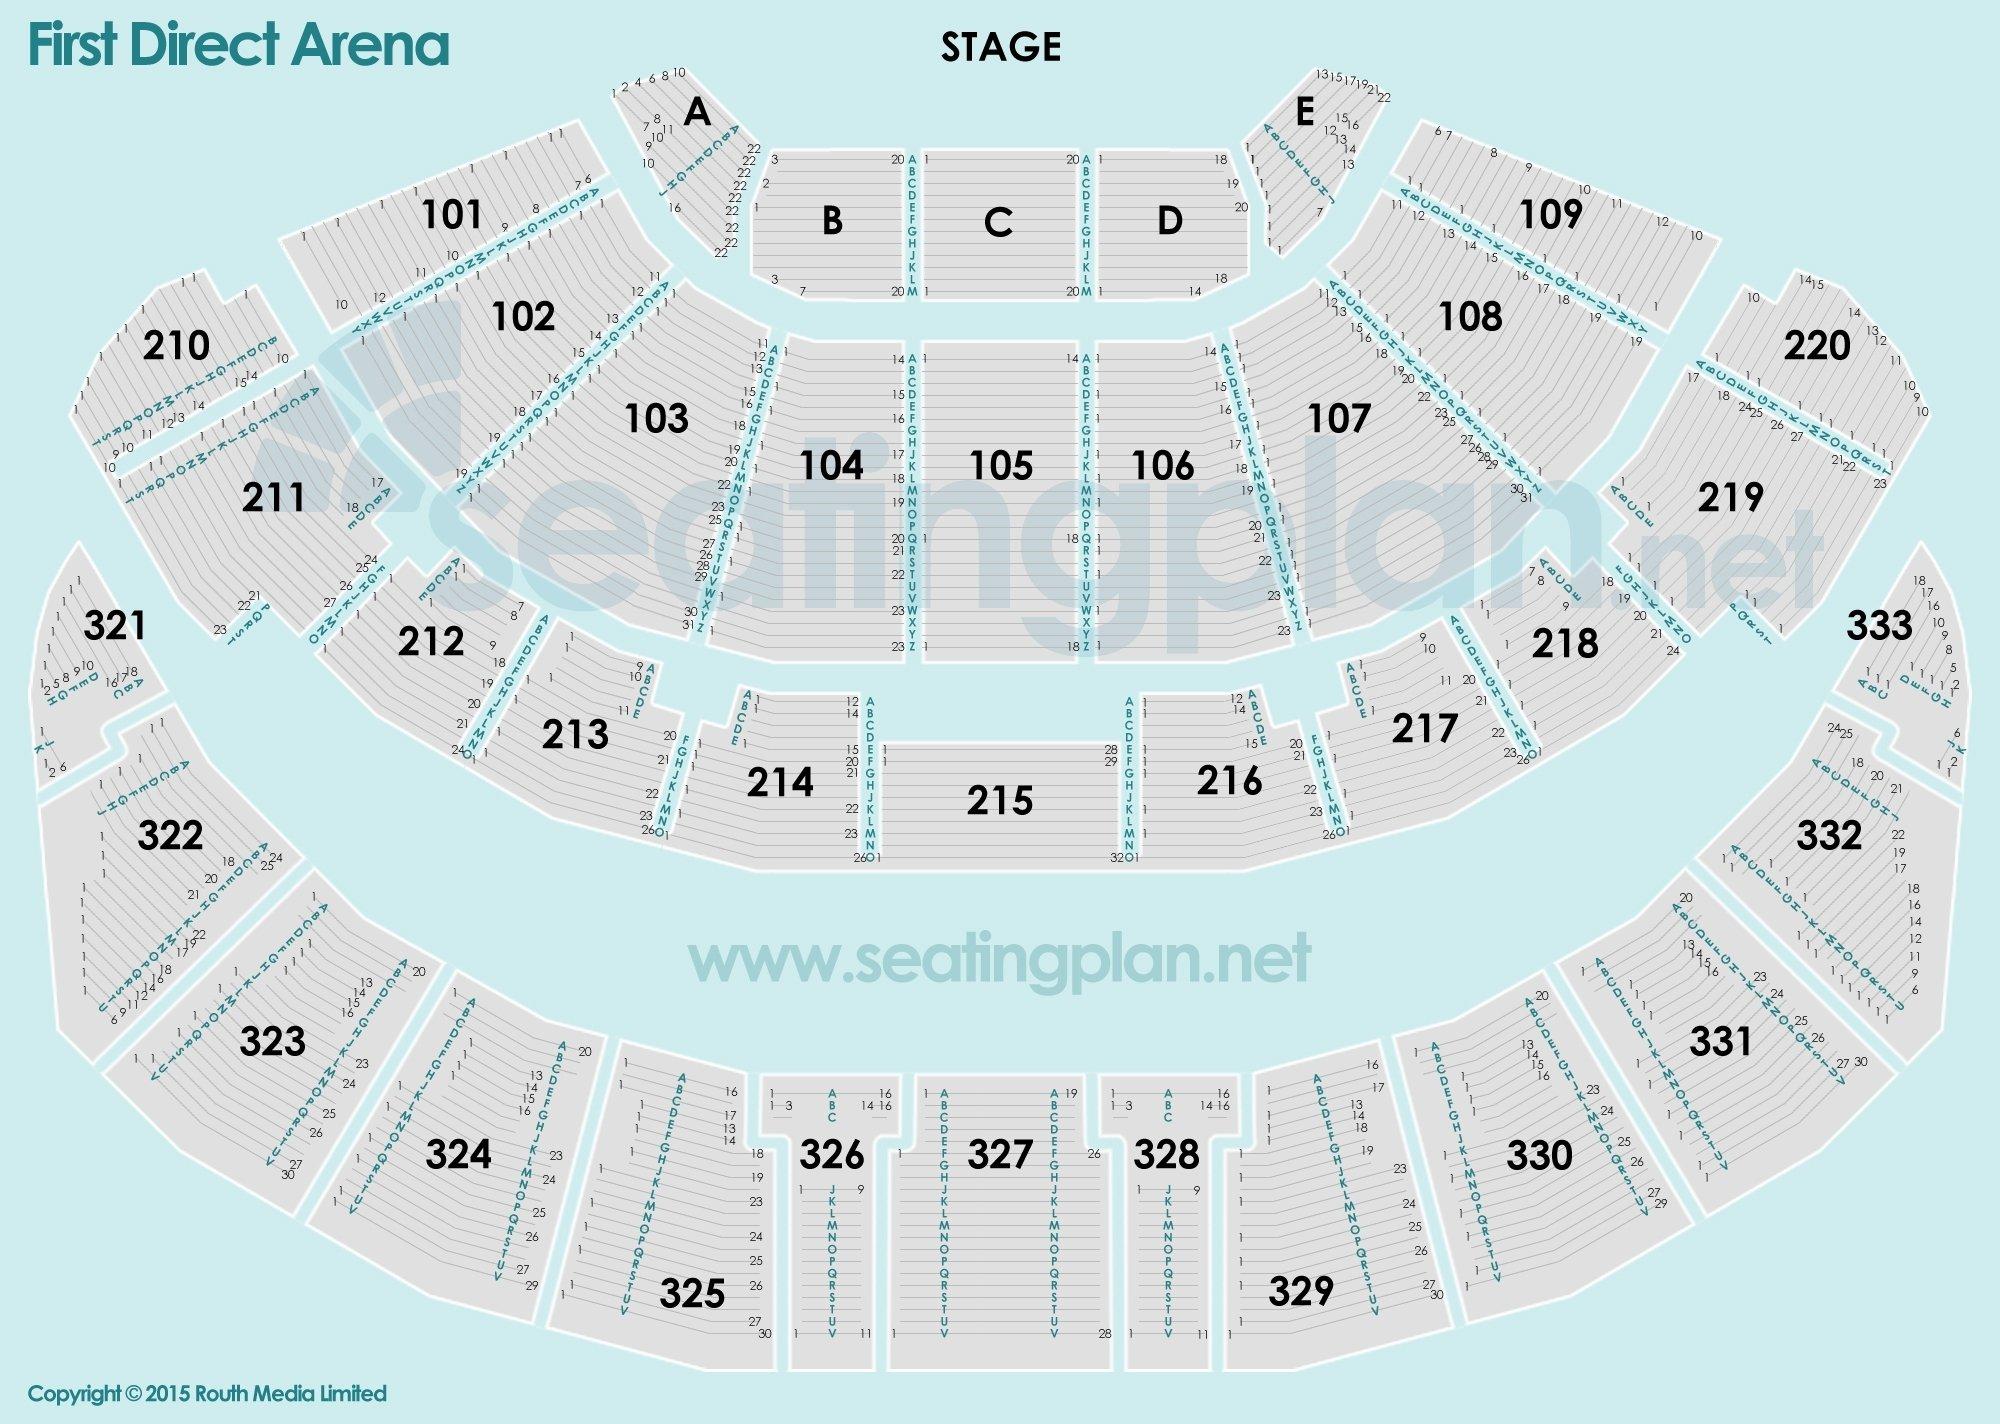 First Direct Arena Leeds Seating Plan